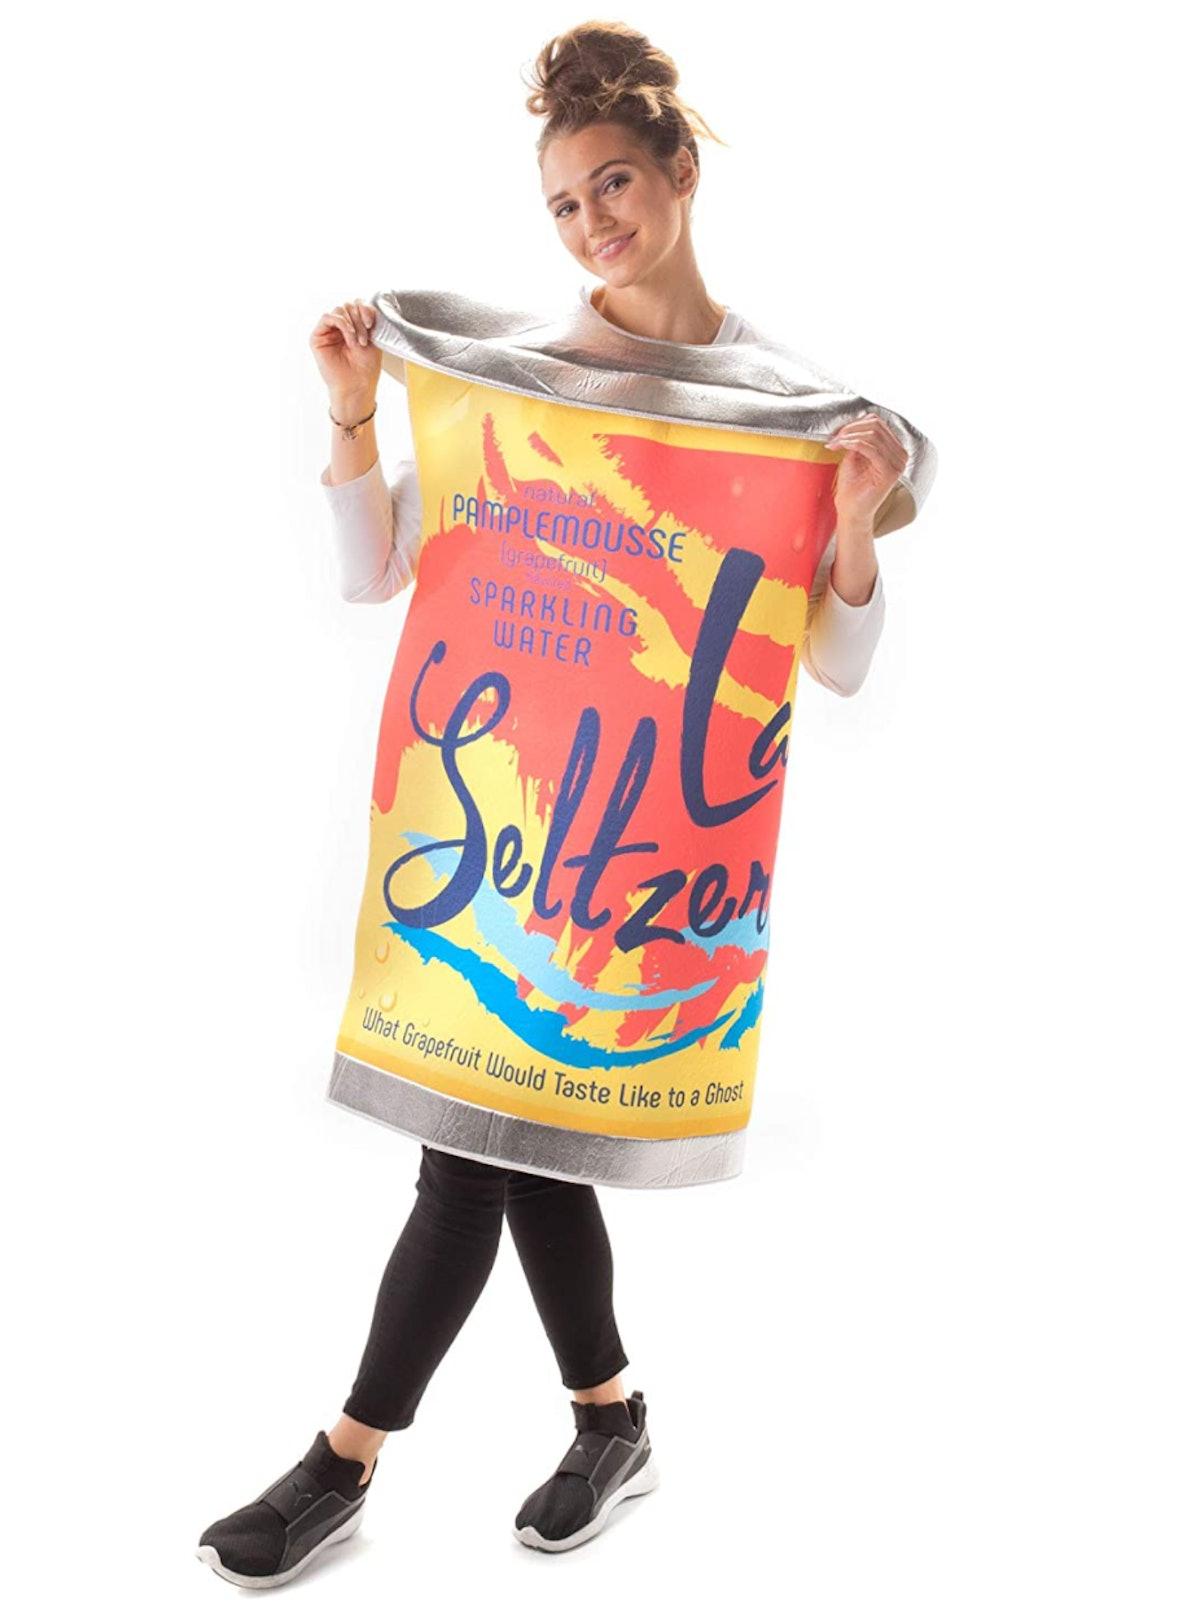 La Seltzer Soda Can Halloween Costume